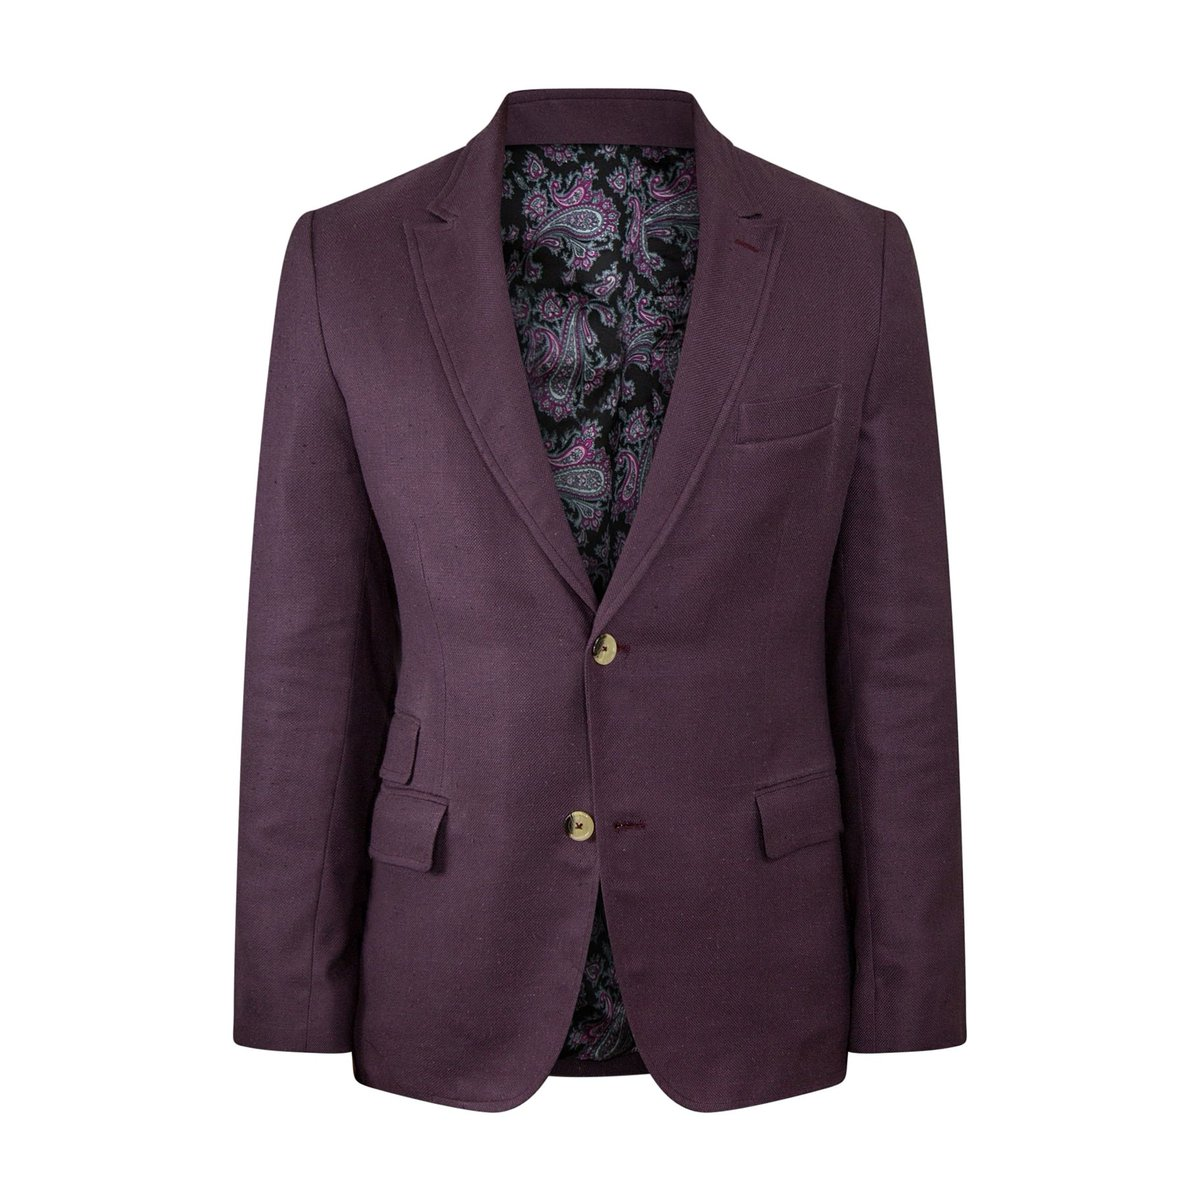 NAREEK couture  Top quality menswear    #menswear #couture #quality #luxury #buyers #blogger #lifestyleandleisure #bespoke #checks #shopping #ecommerce #dubai #travel #fashion #retail #business #deals #marketing #startups #entrepreneur #startup